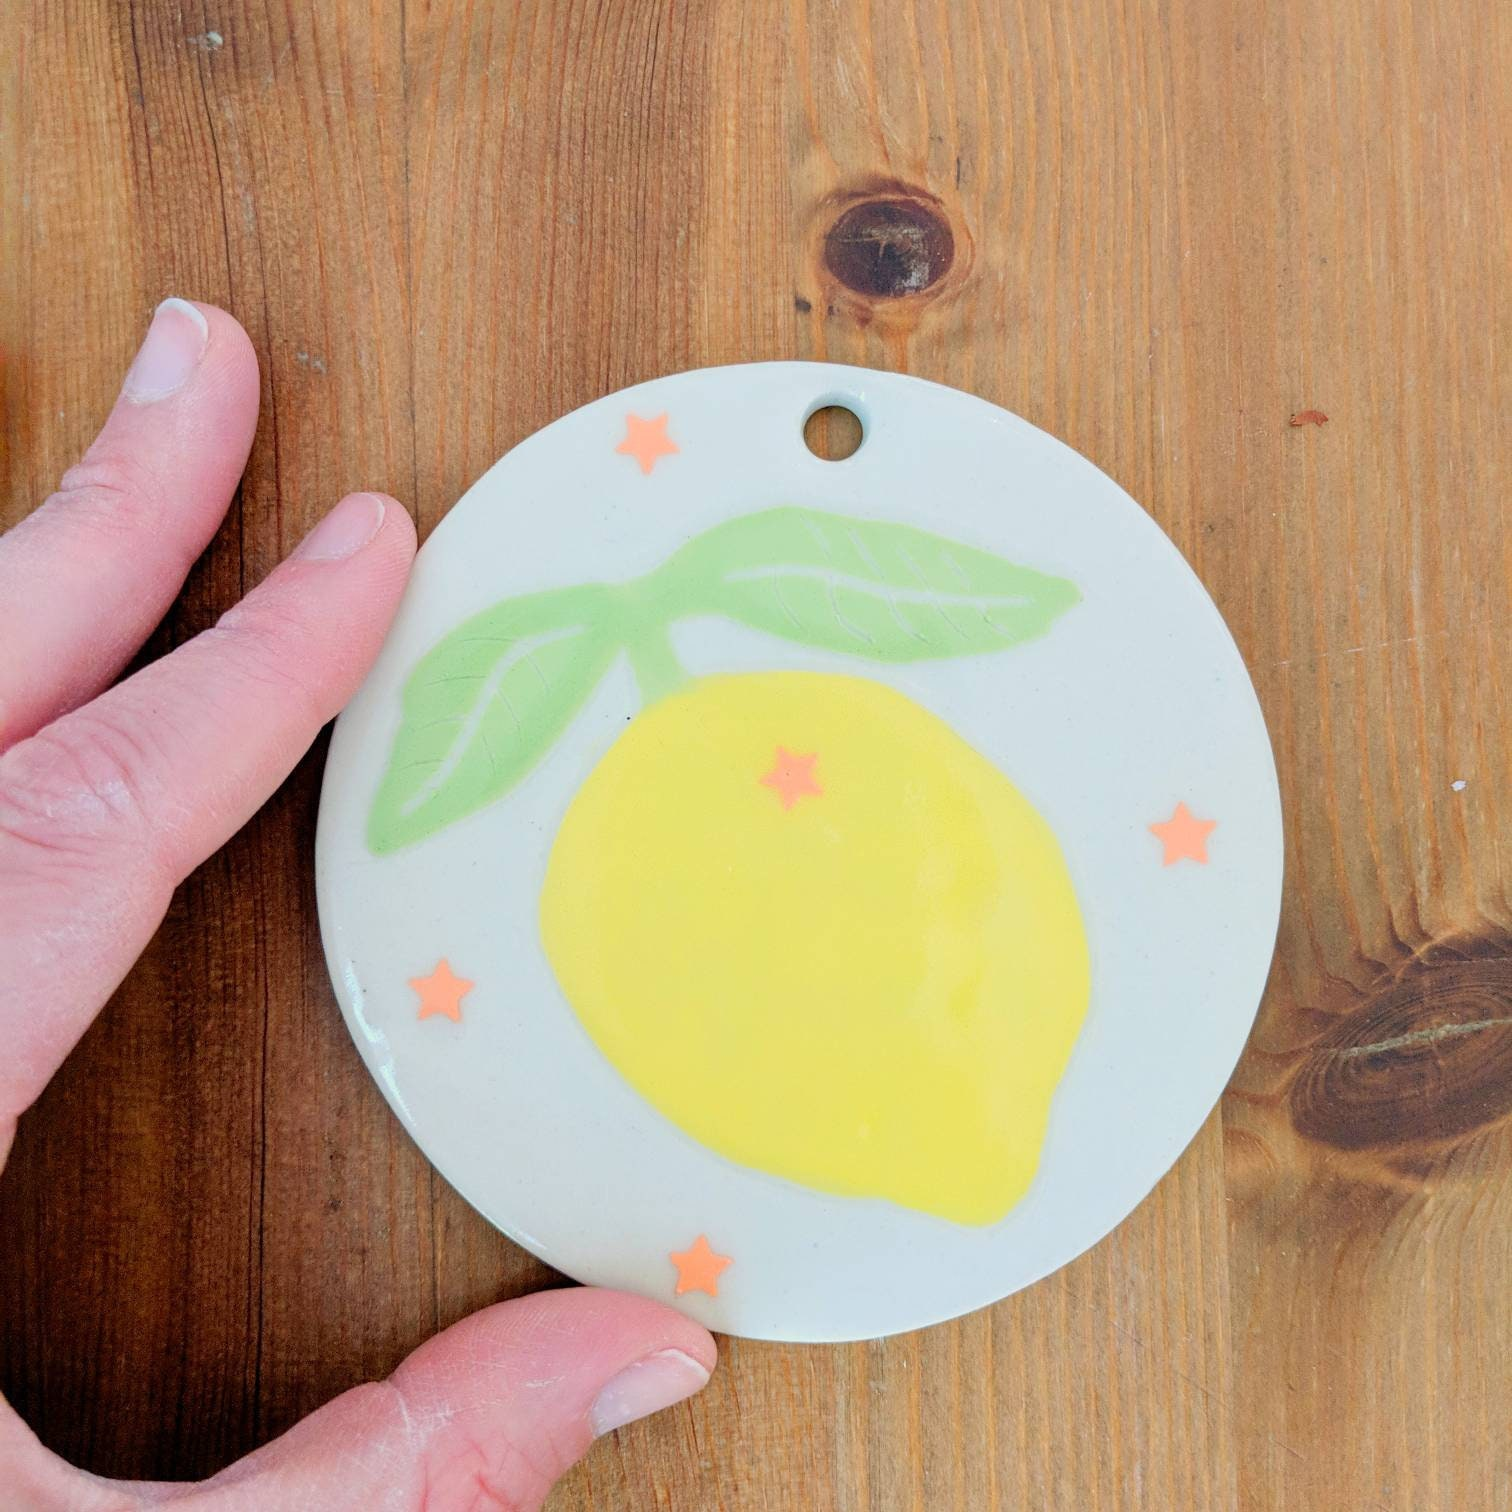 LEMON WALL DECOR: Lemon Decor Kitchen Ceramic lemon Ceramic